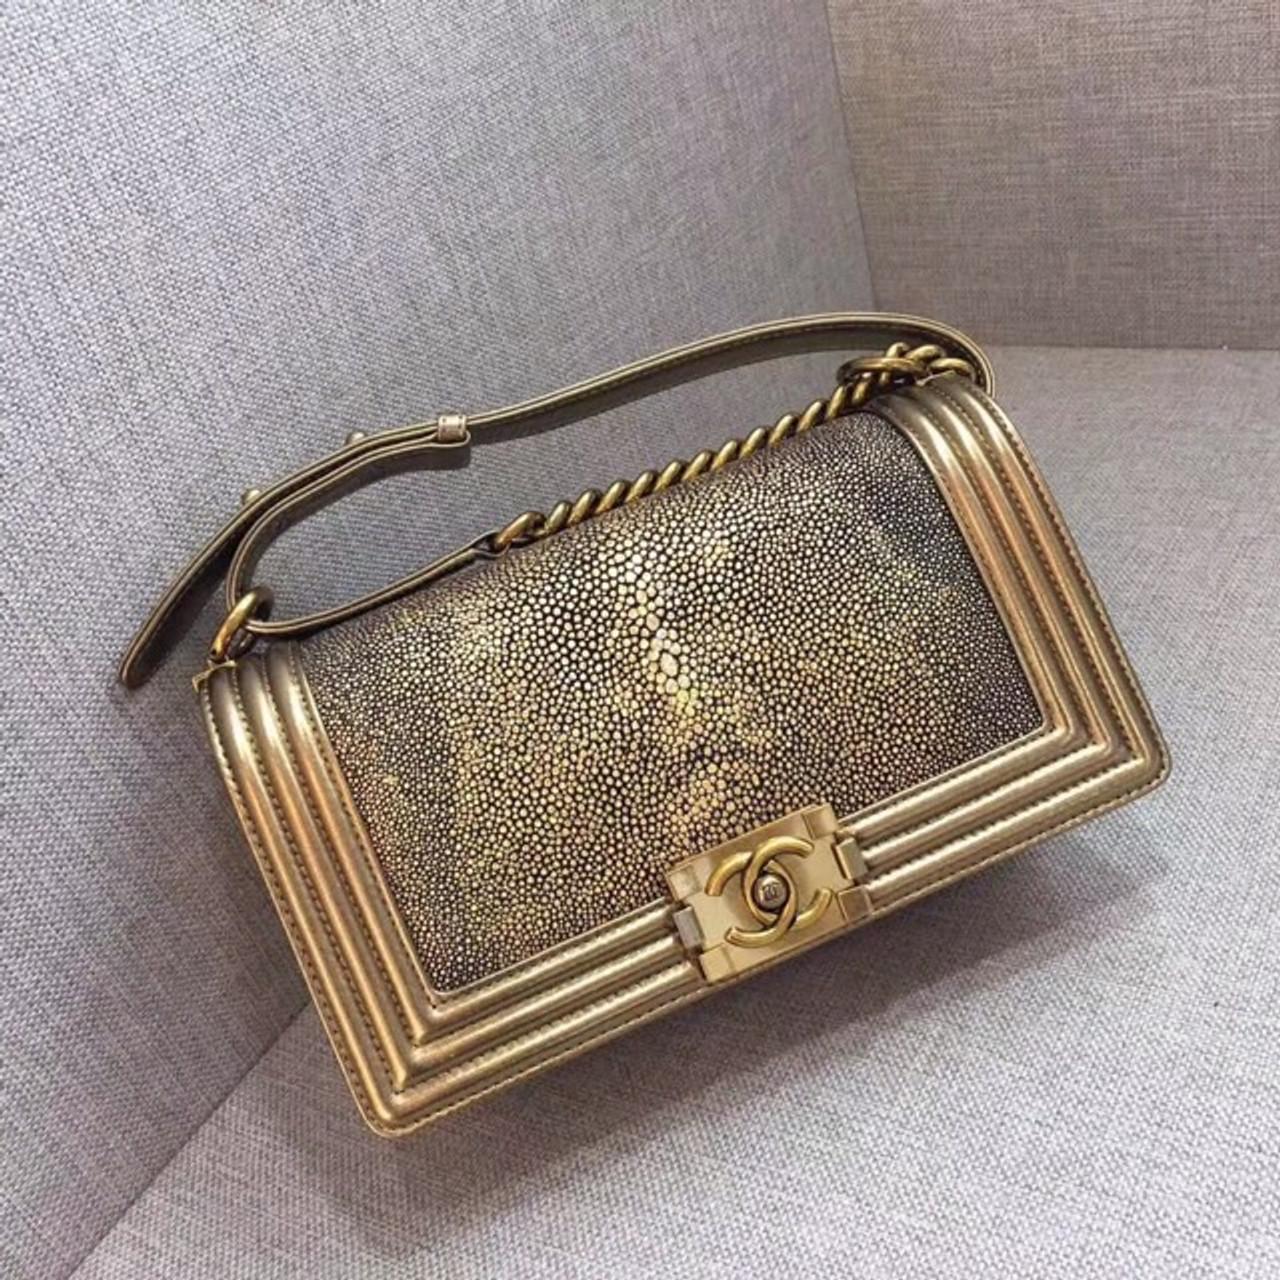 cde3d90603a1f7 Chanel Metallic Gold Stingray Medium Boy Bag - Bella Vita Moda